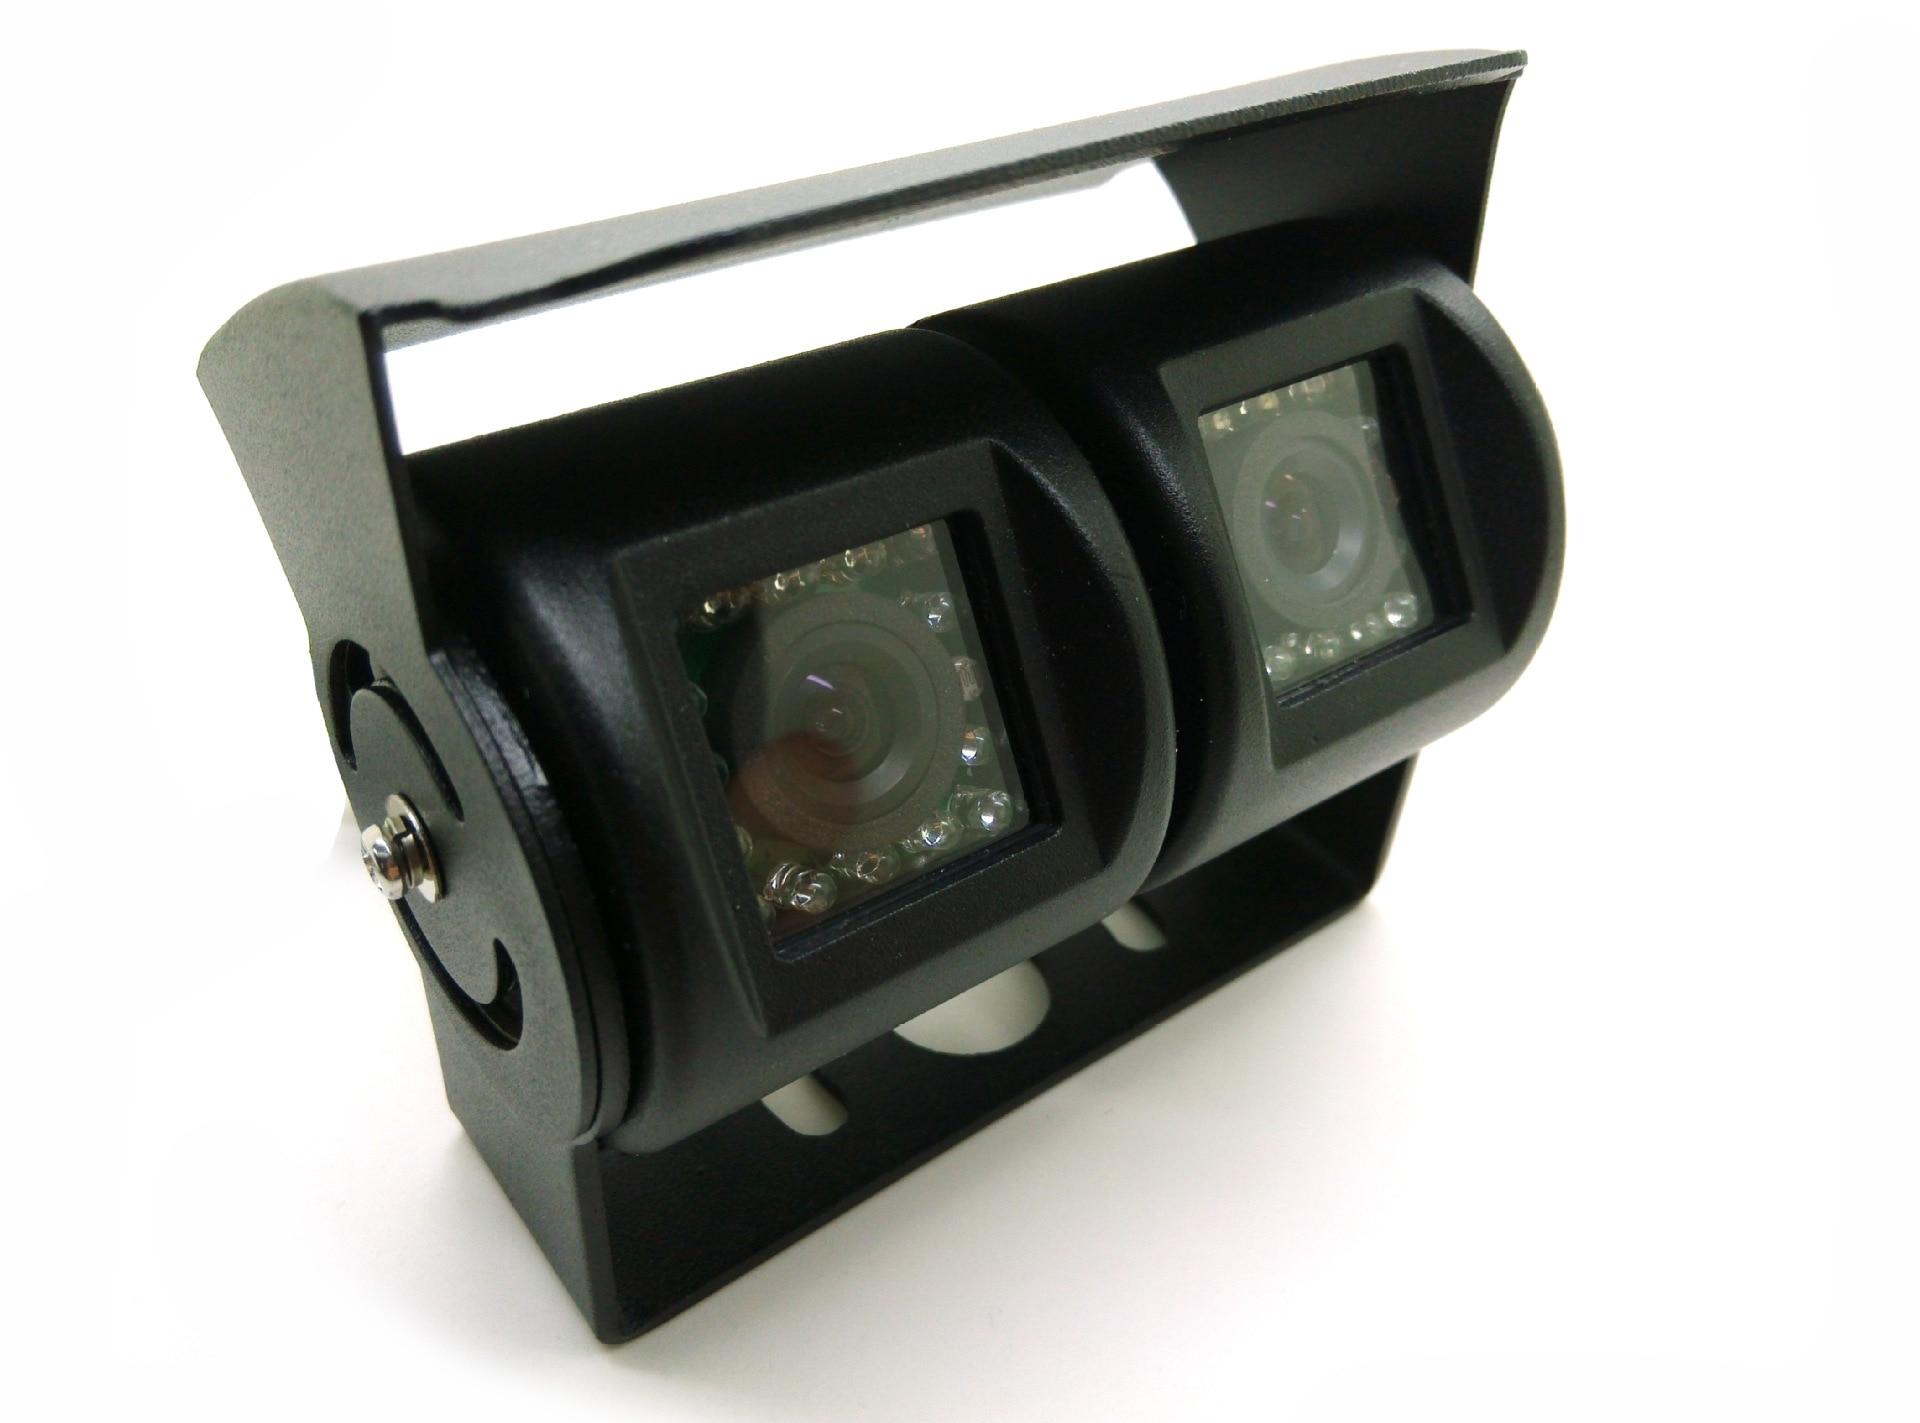 купить Bus bus passenger car CCD HD camera visual reversing video monitoring system недорого